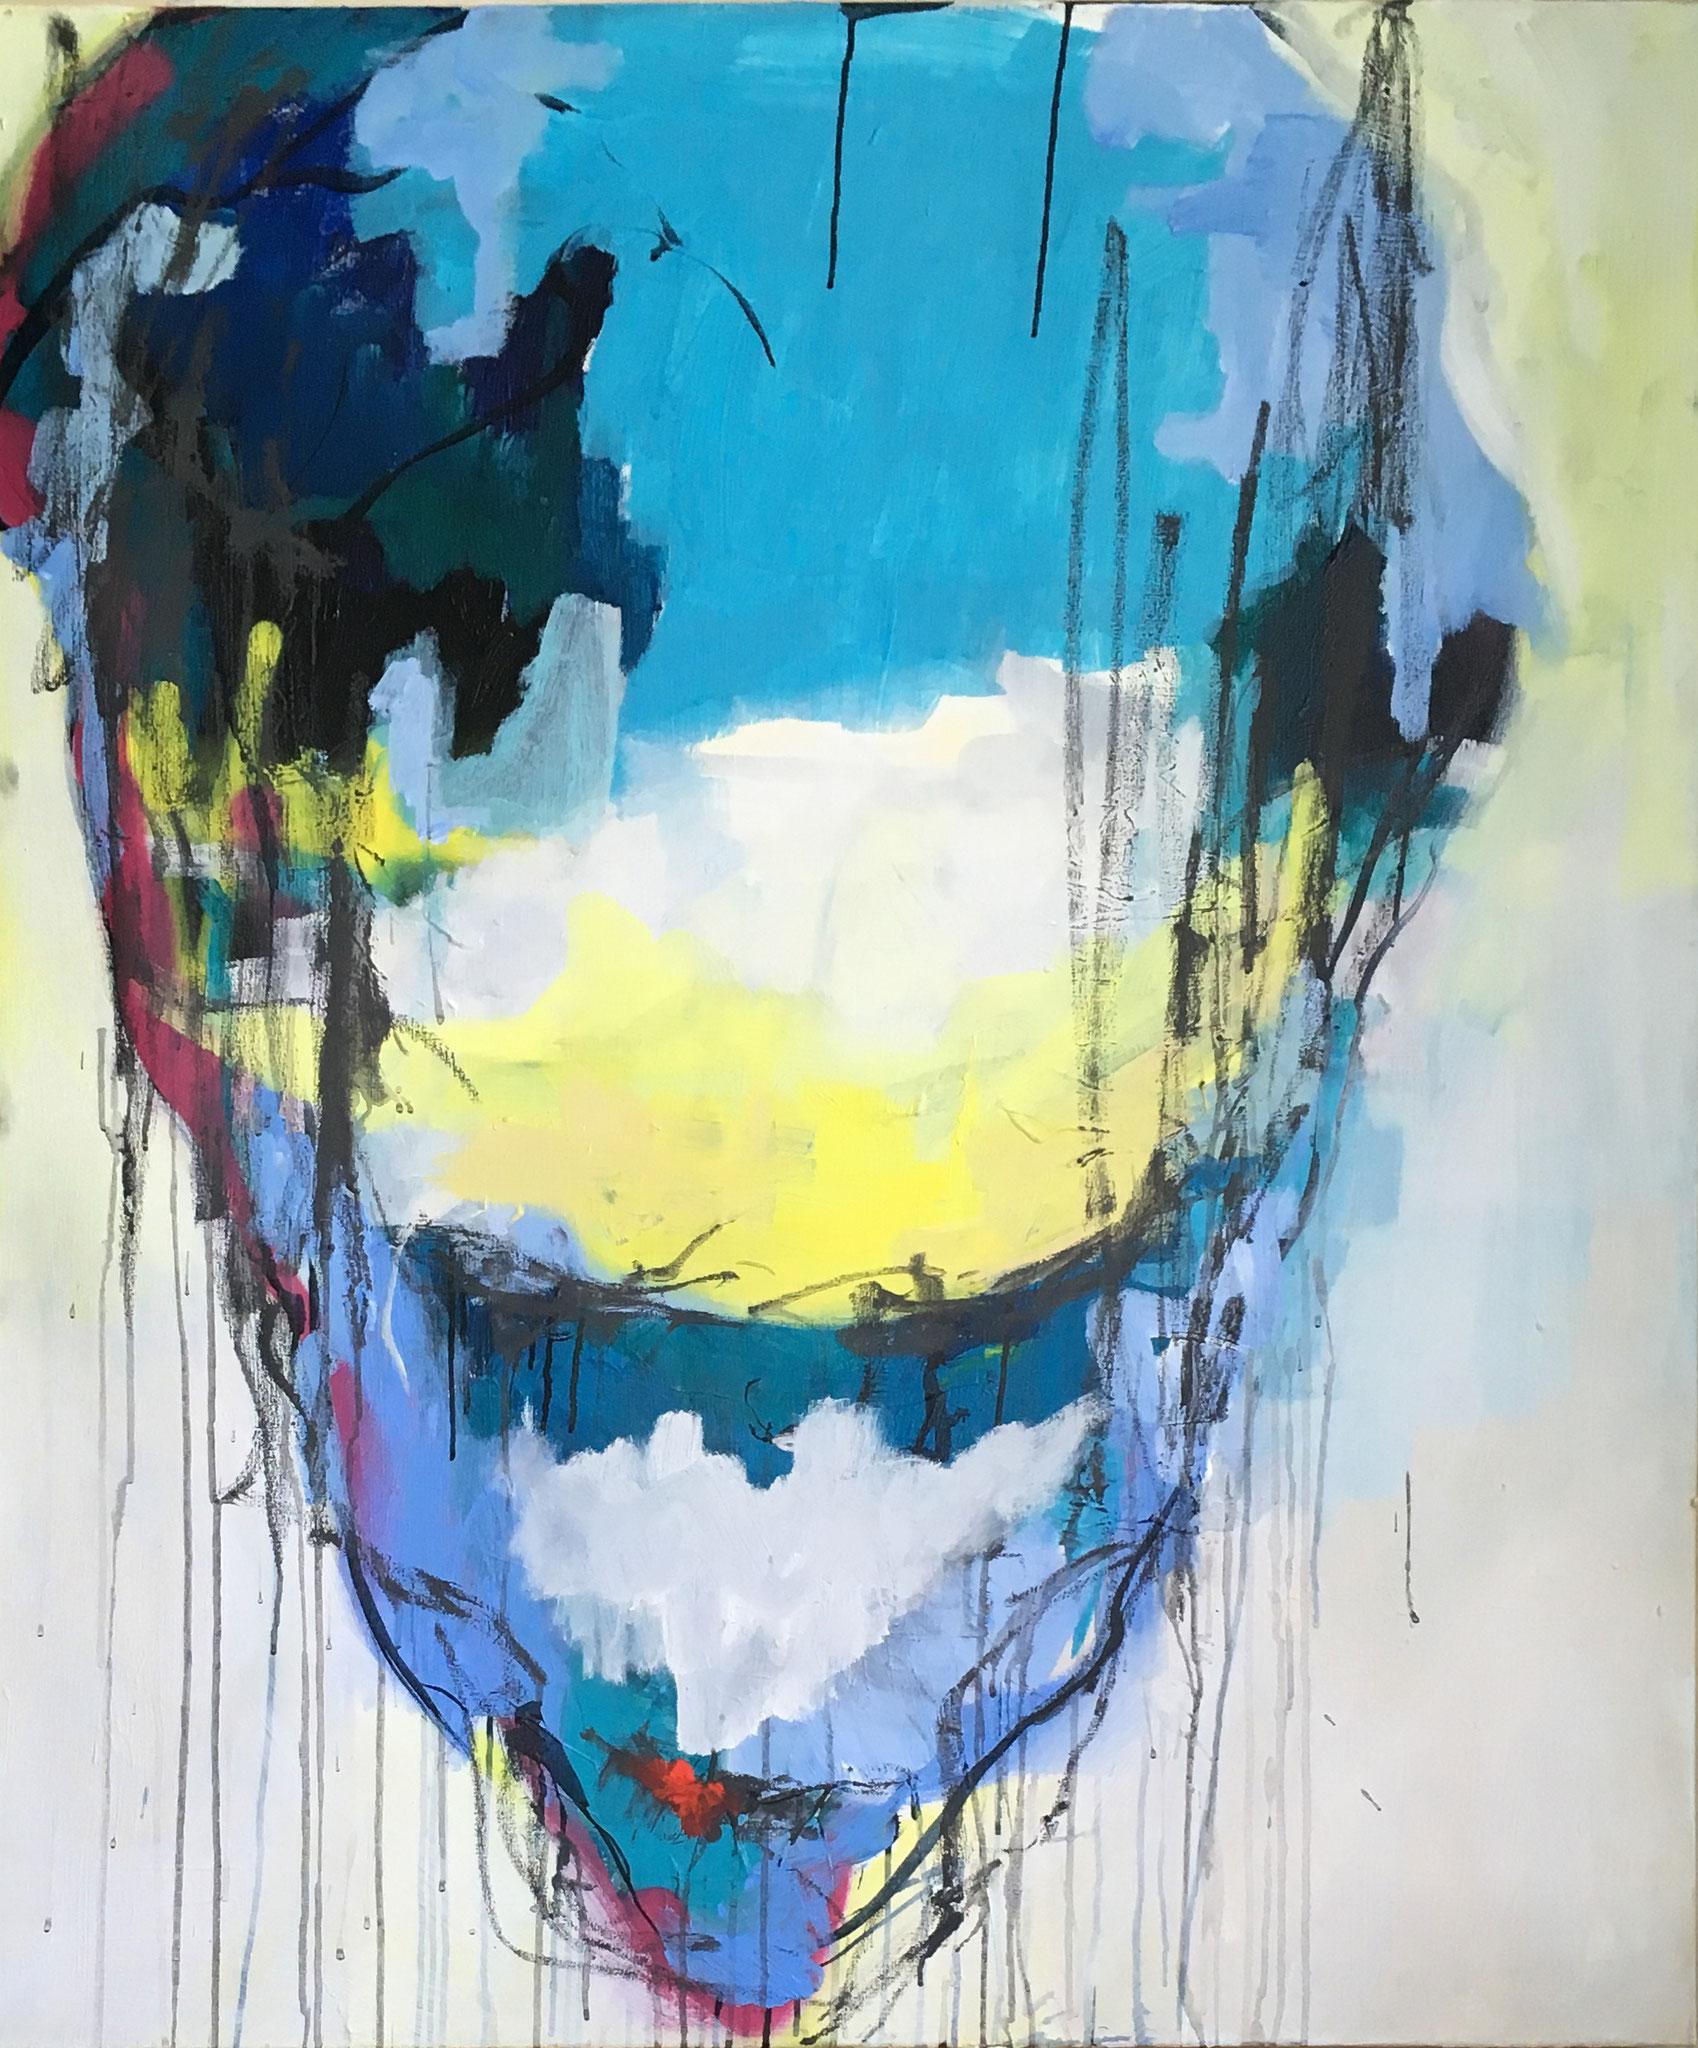 ein zweifelhaftes Porträt (Acrylic, Gesso, Ink, Spray Paint, Gouache on Canvas, 120x100cm)